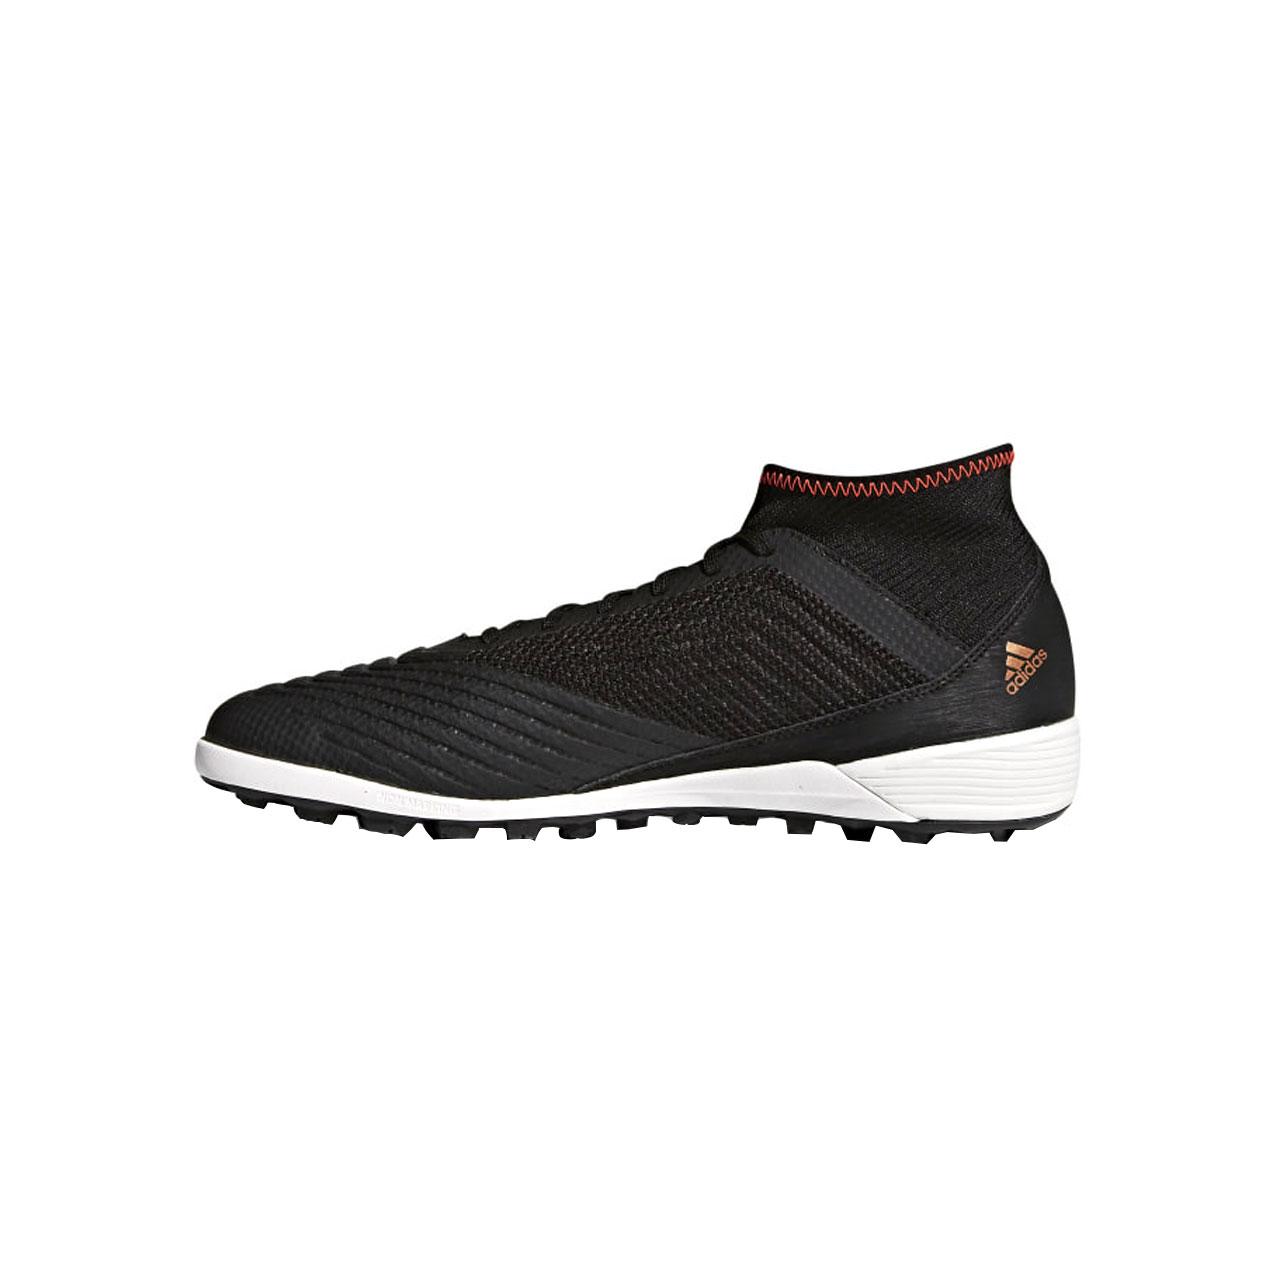 قیمت کفش فوتبال مردانه آدیداس مدل CP9278